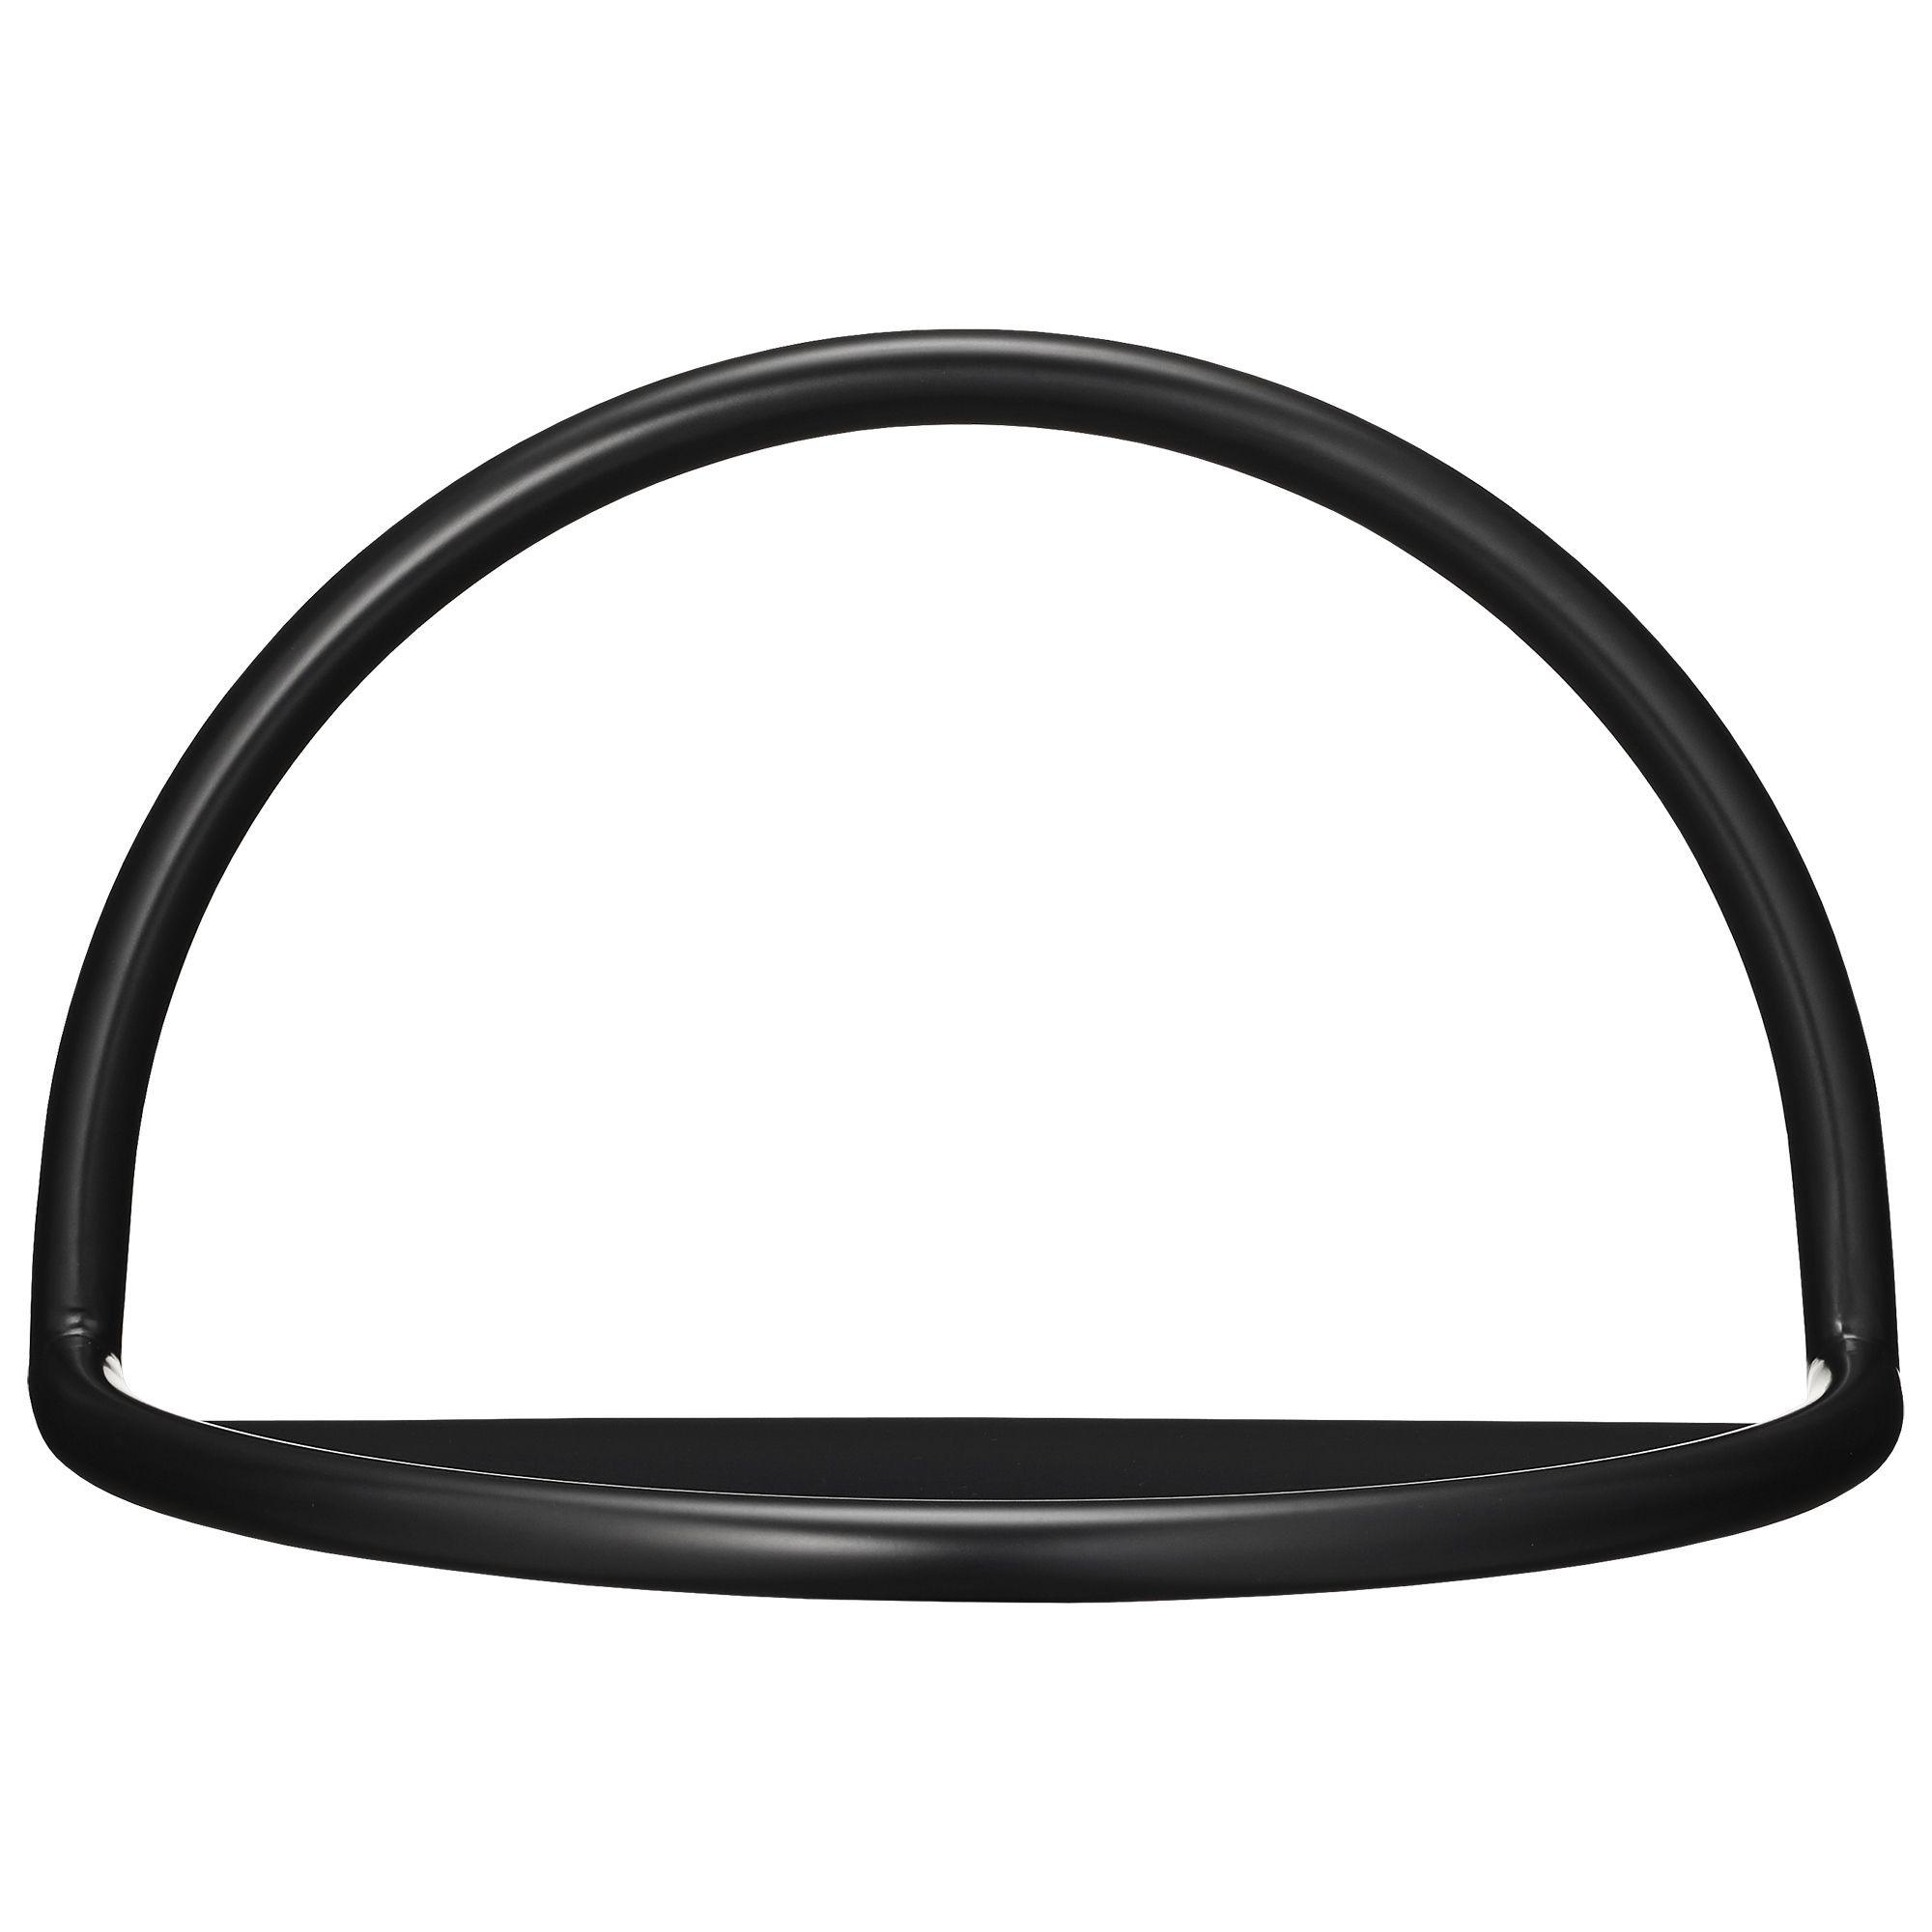 Shelf Angui L 39 cm | Anthracite